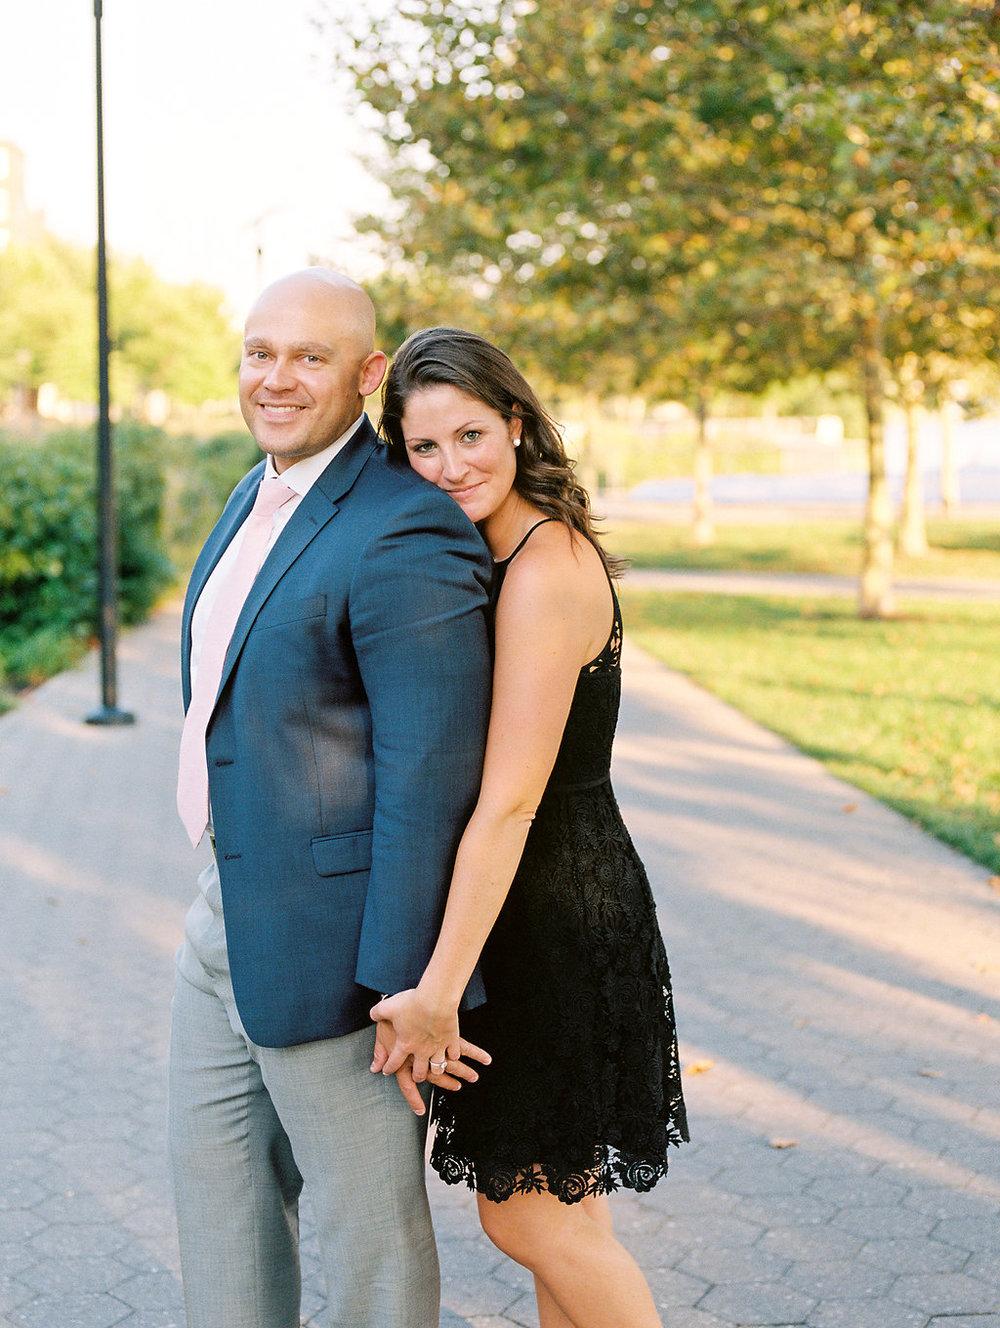 georgetown engagement photos washington dc fine art wedding photographer lissa ryan photography